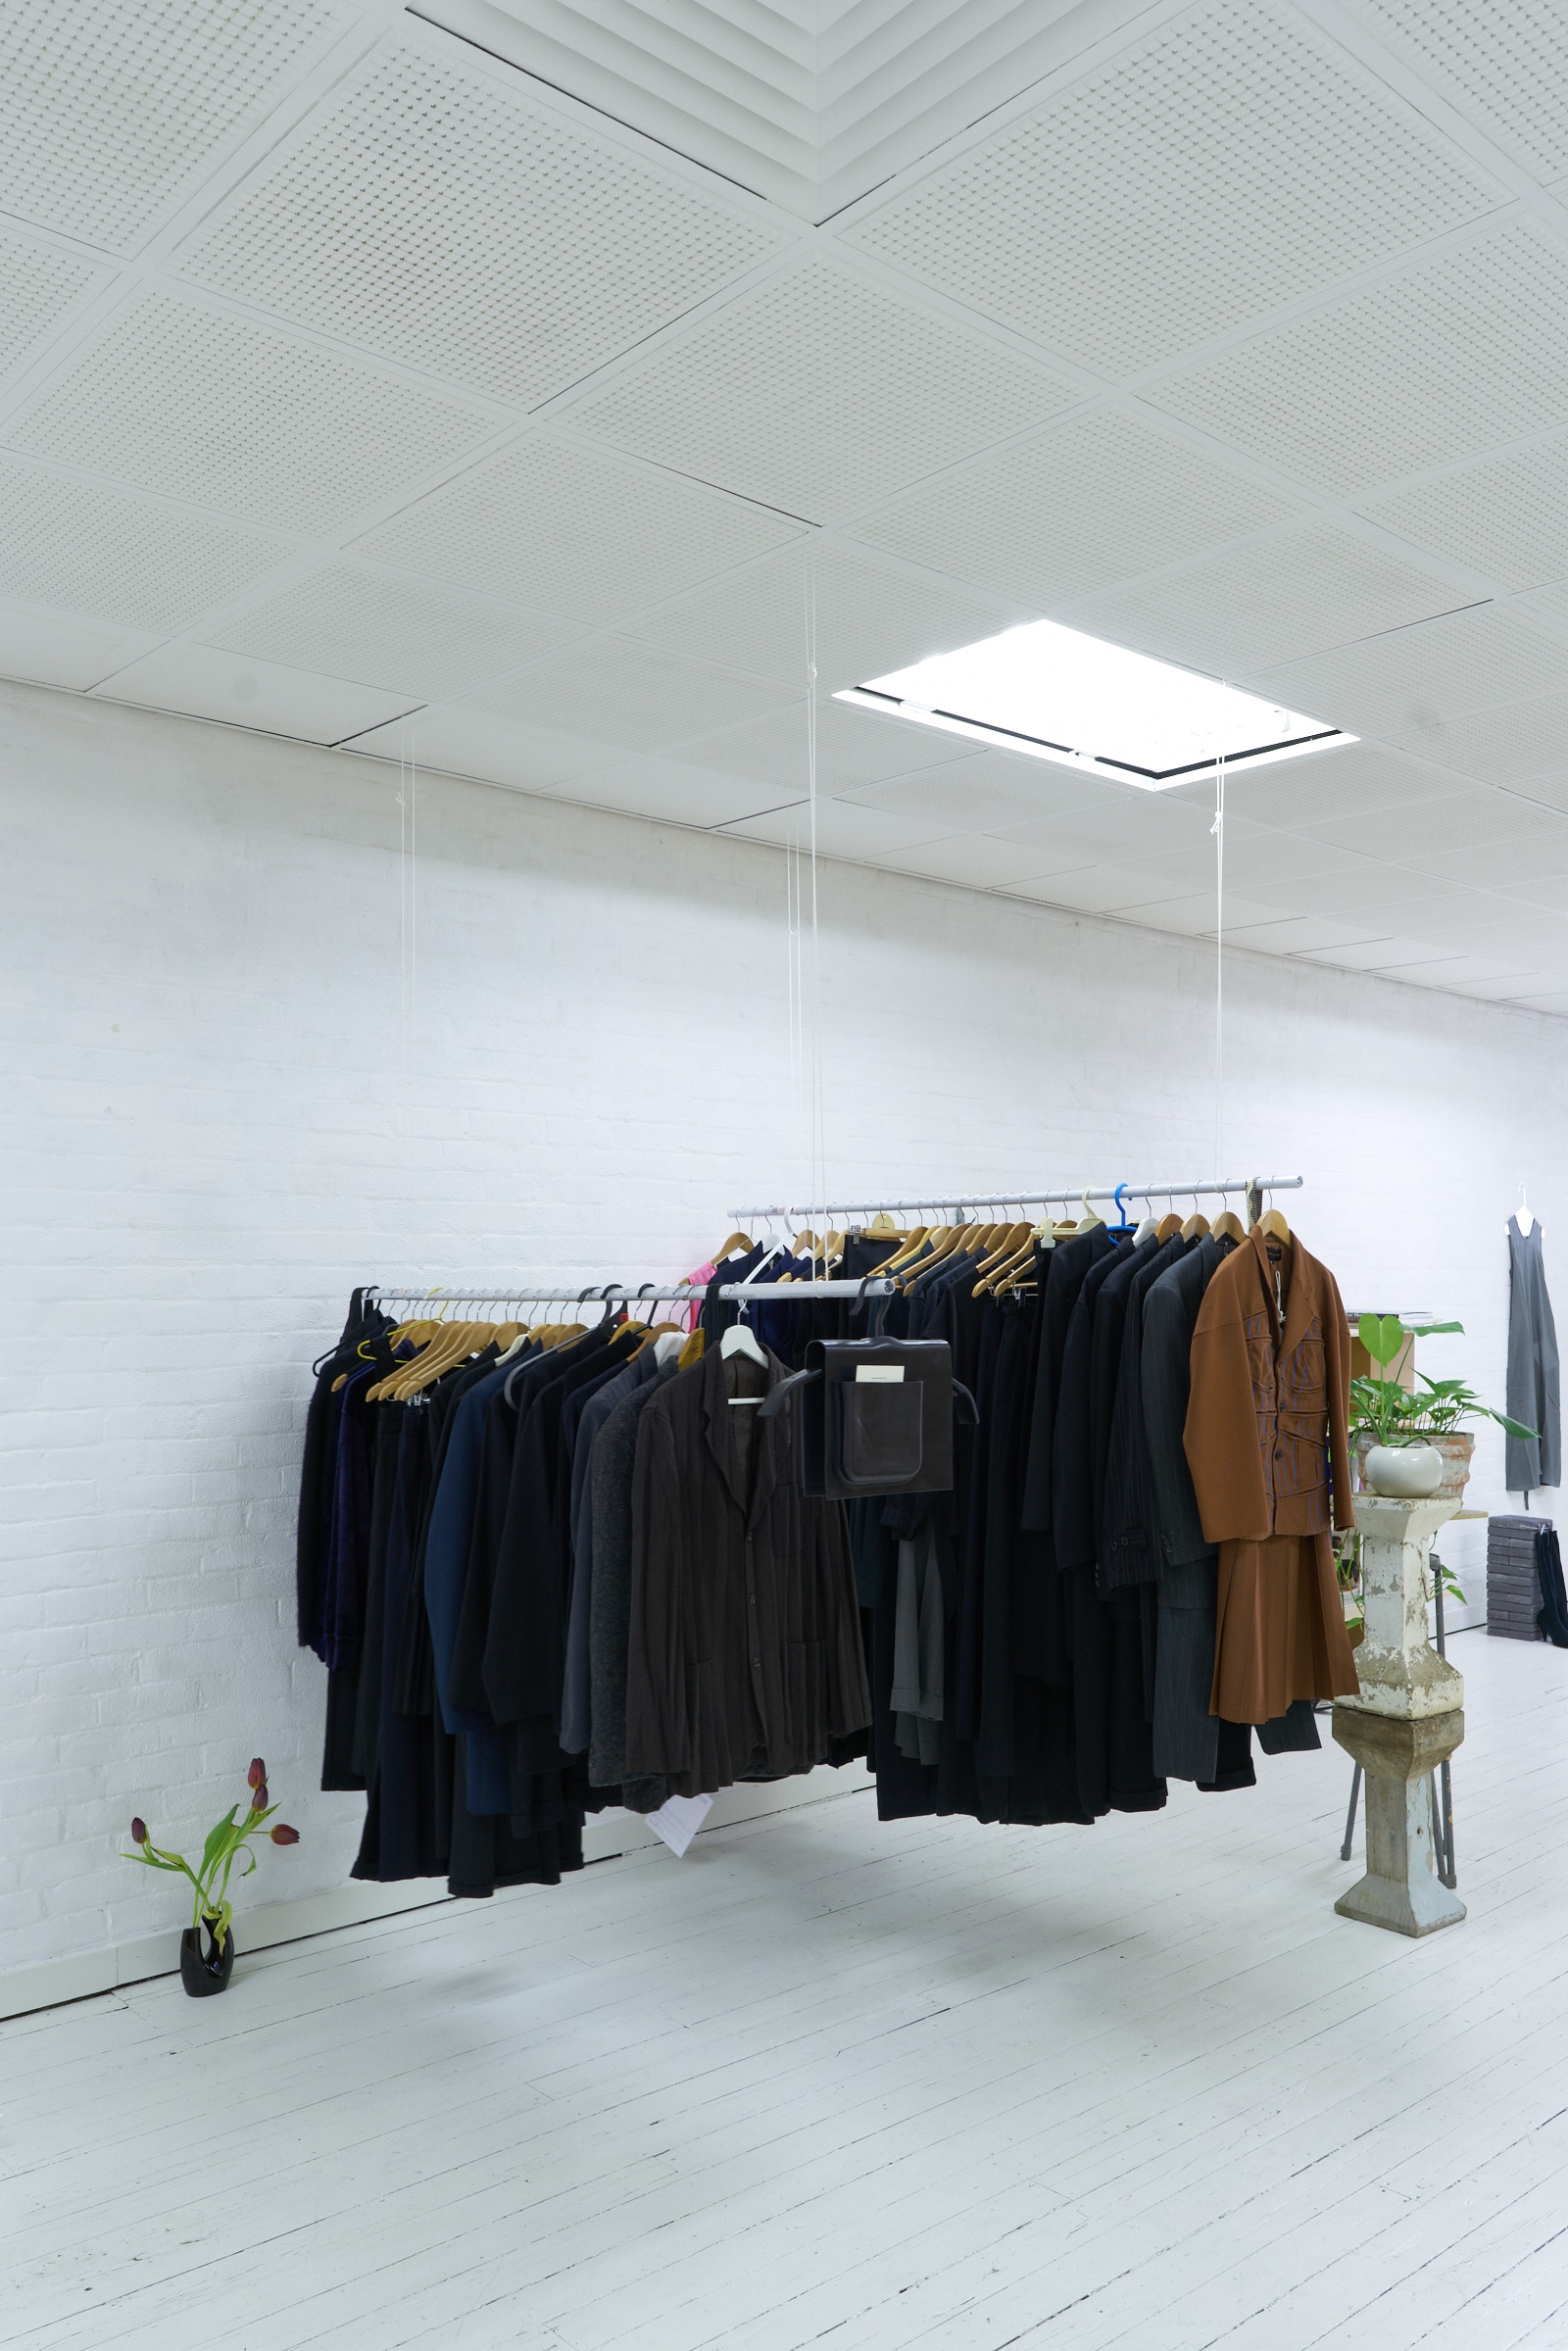 hangers installation view